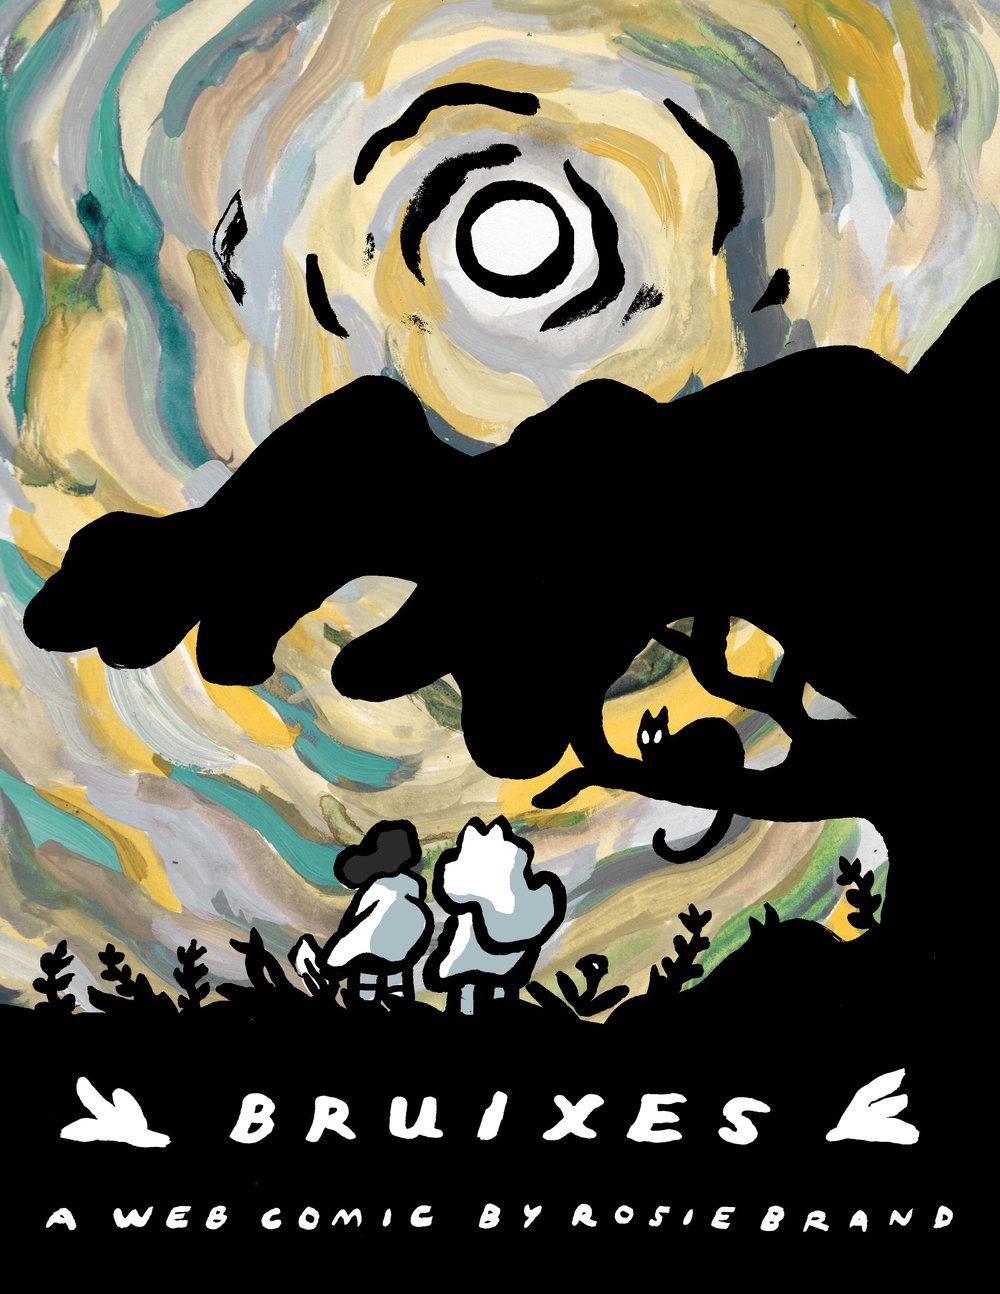 bruixes cover.jpg